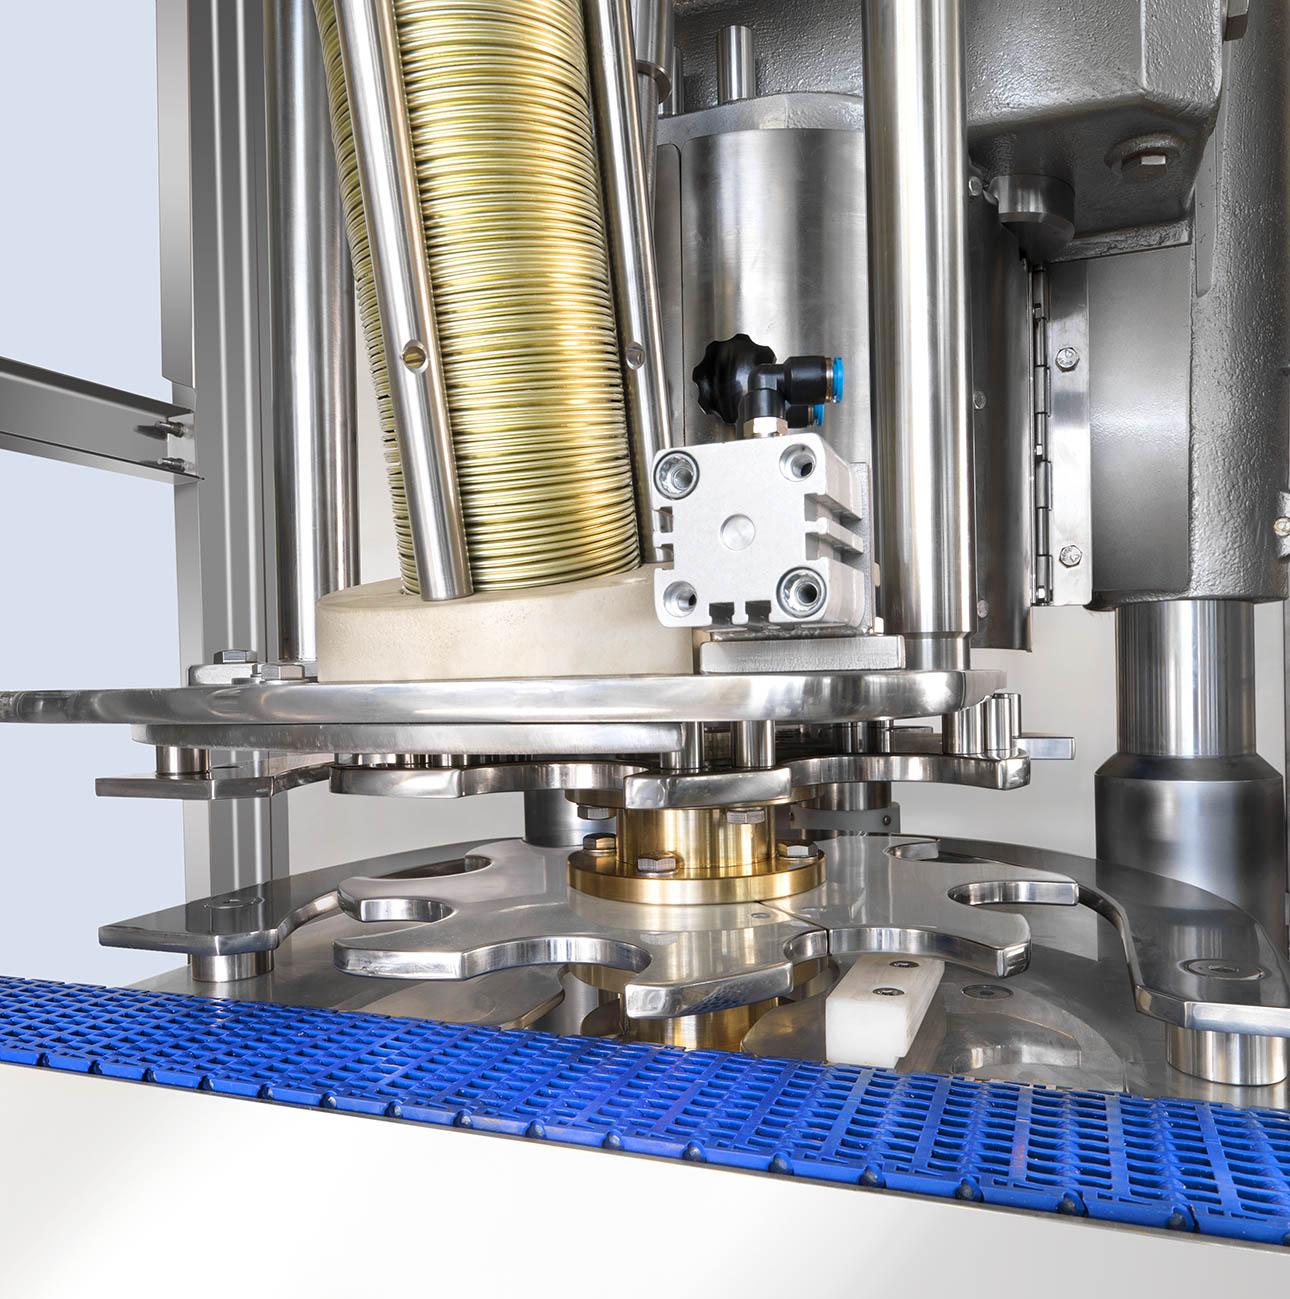 from view K40 Bonicomm star gear - cheap automatic seamer - economic automatic seamer